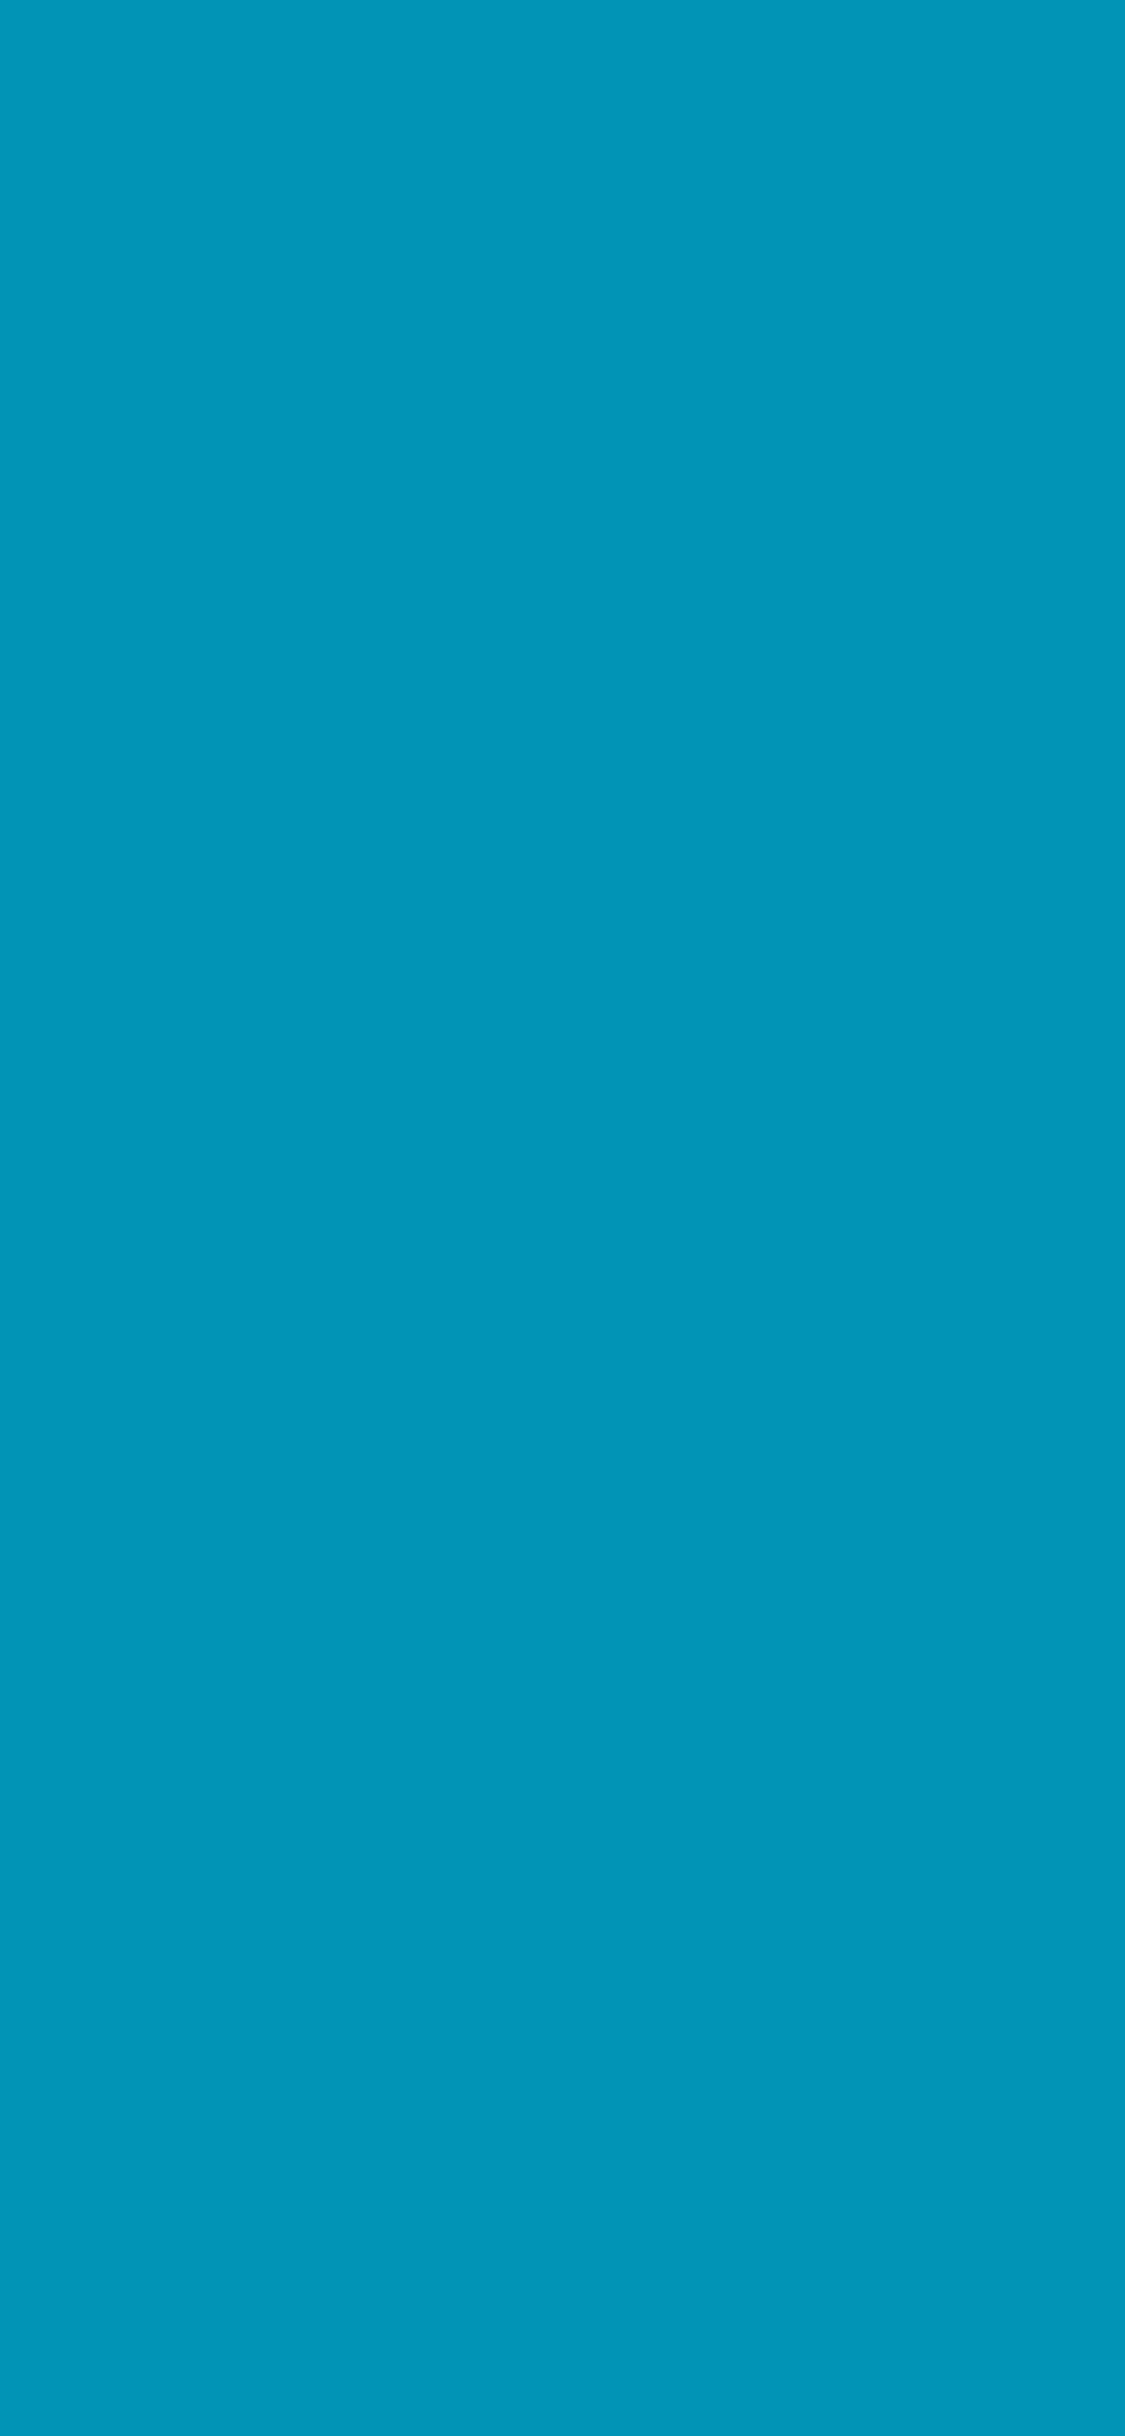 1125x2436 Bondi Blue Solid Color Background